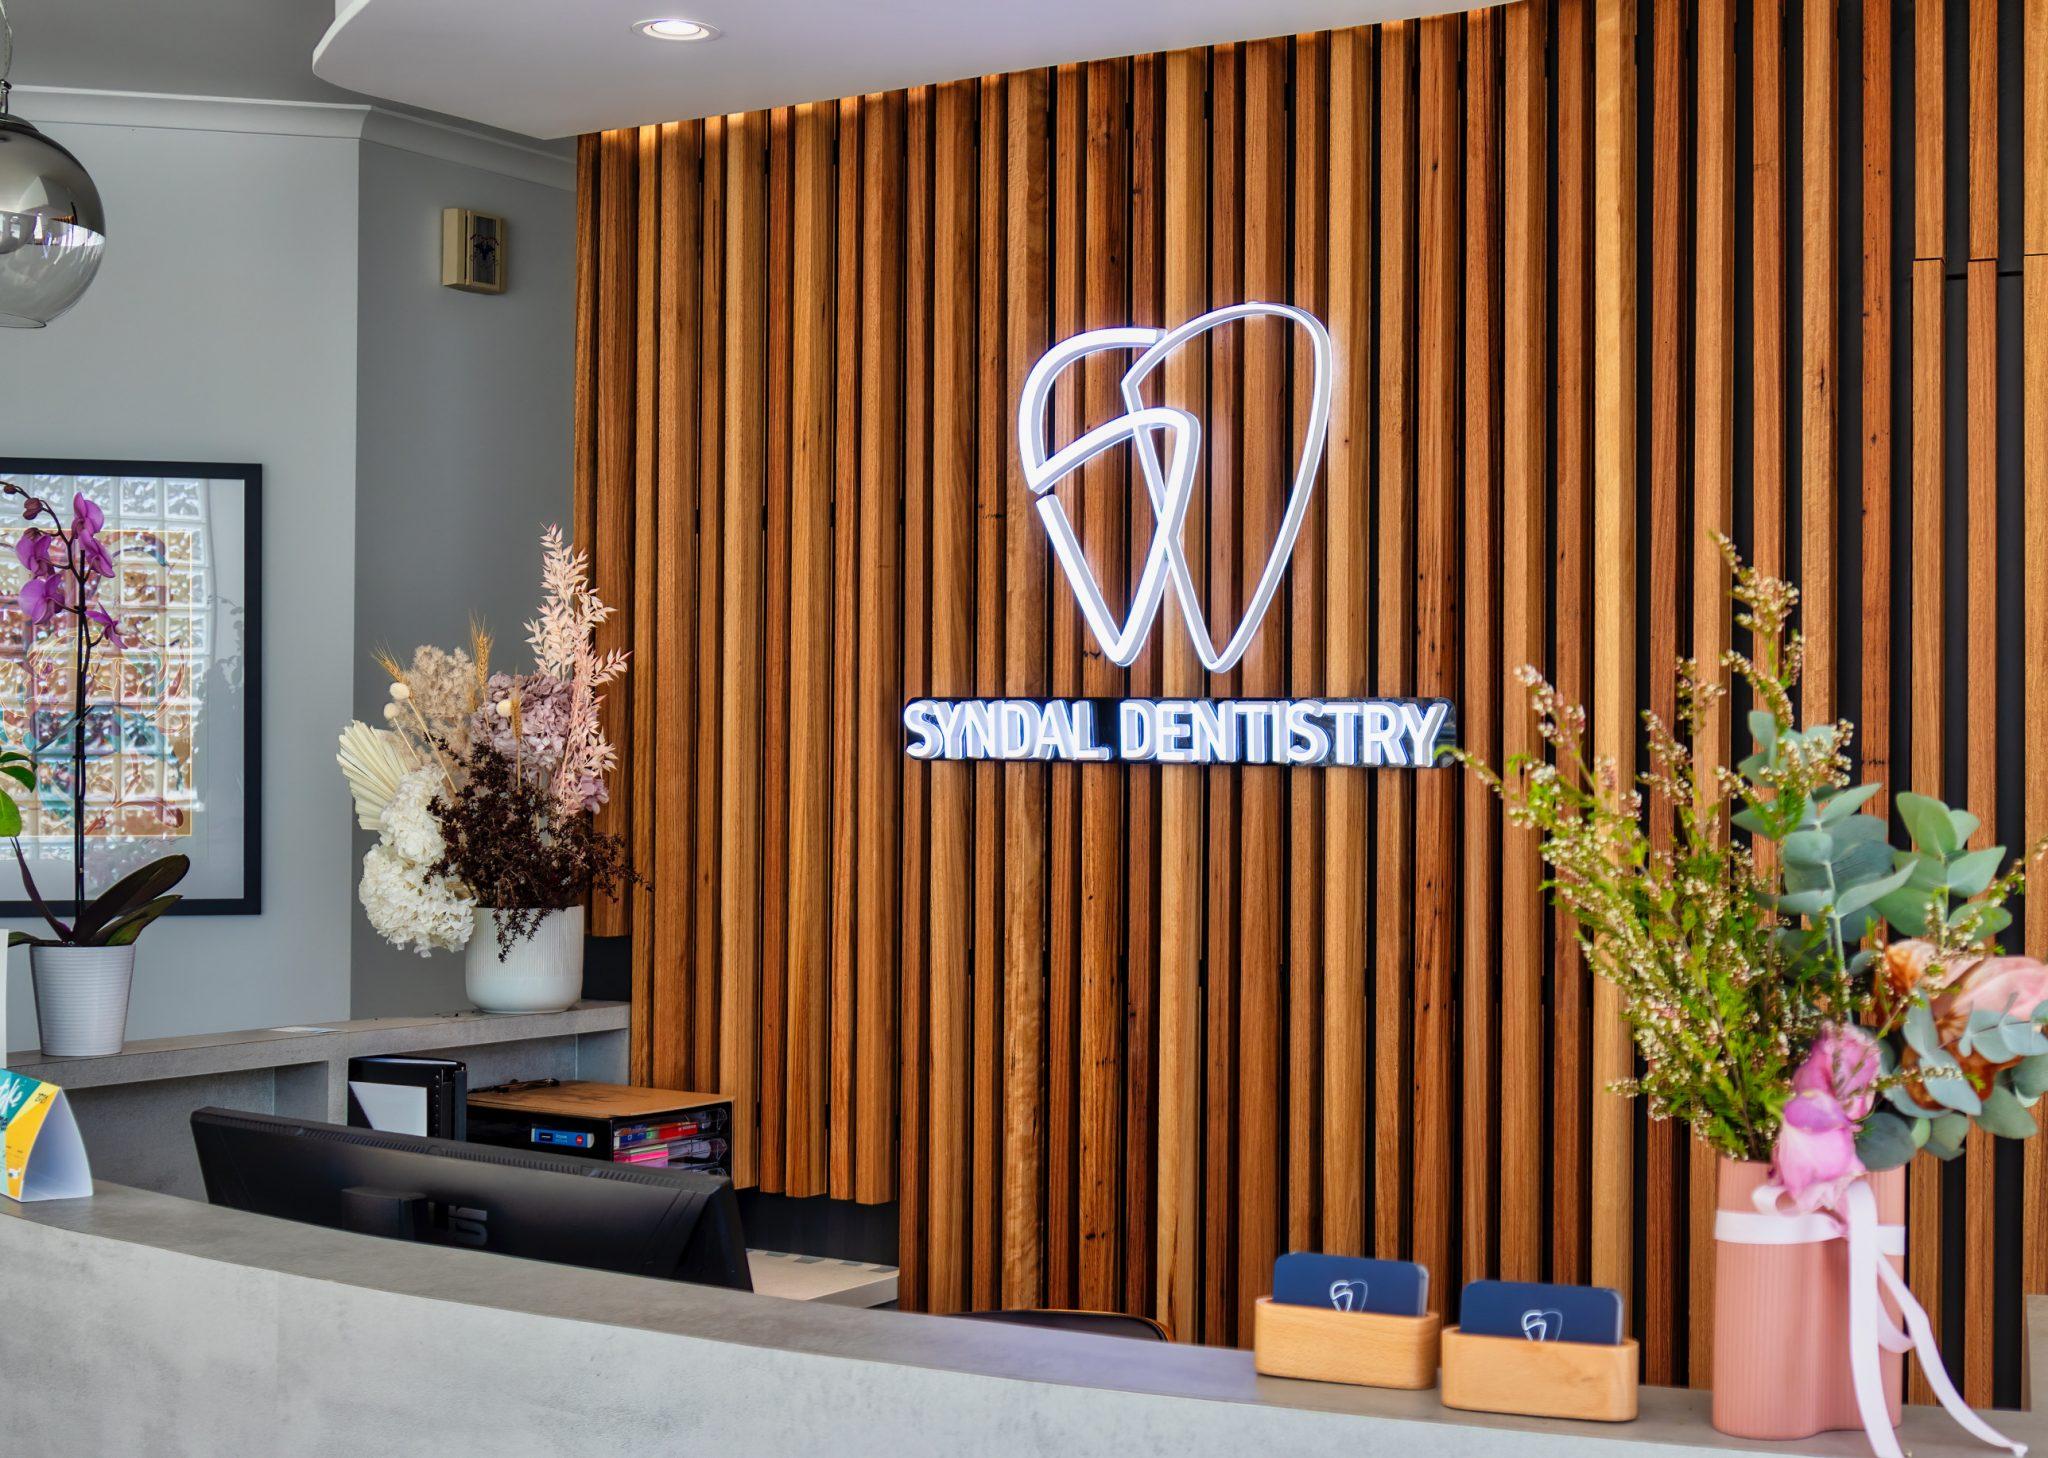 Syndal Dentistry